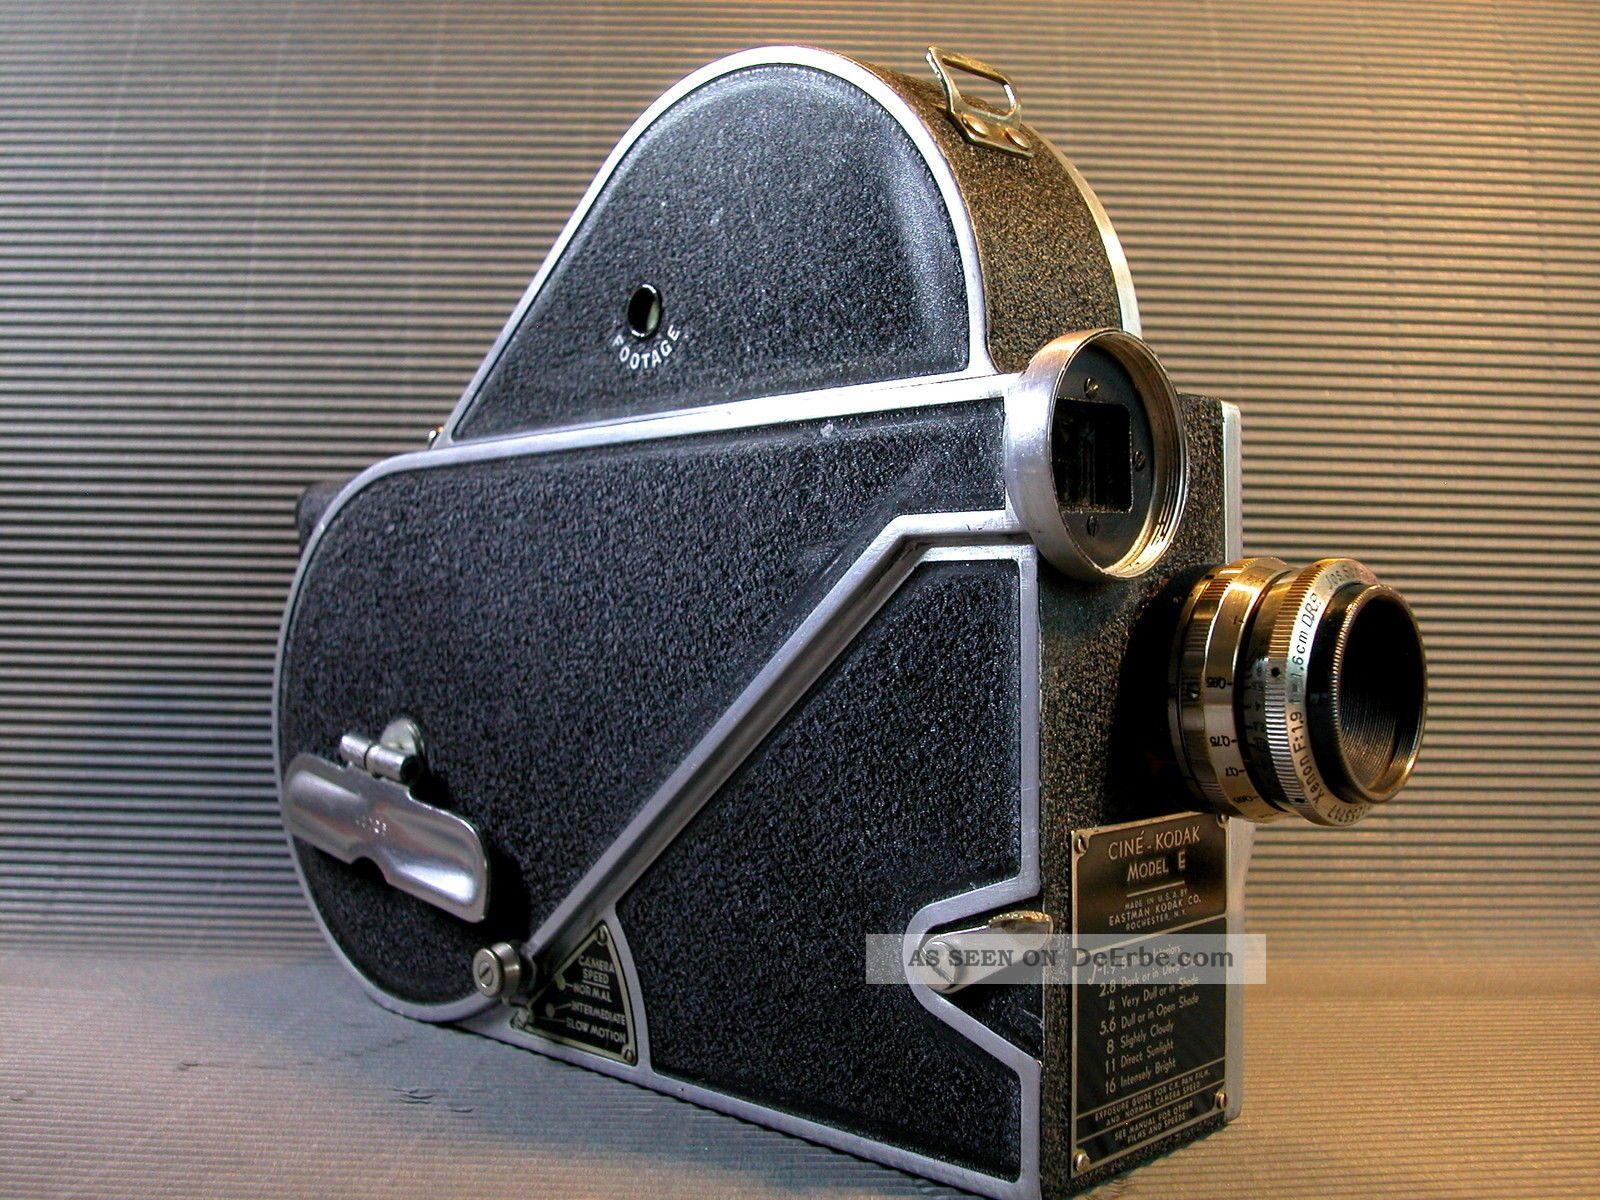 Kodak cine model e 16mm filmkamera federwerk 30er jahre for Mobel 30er jahre